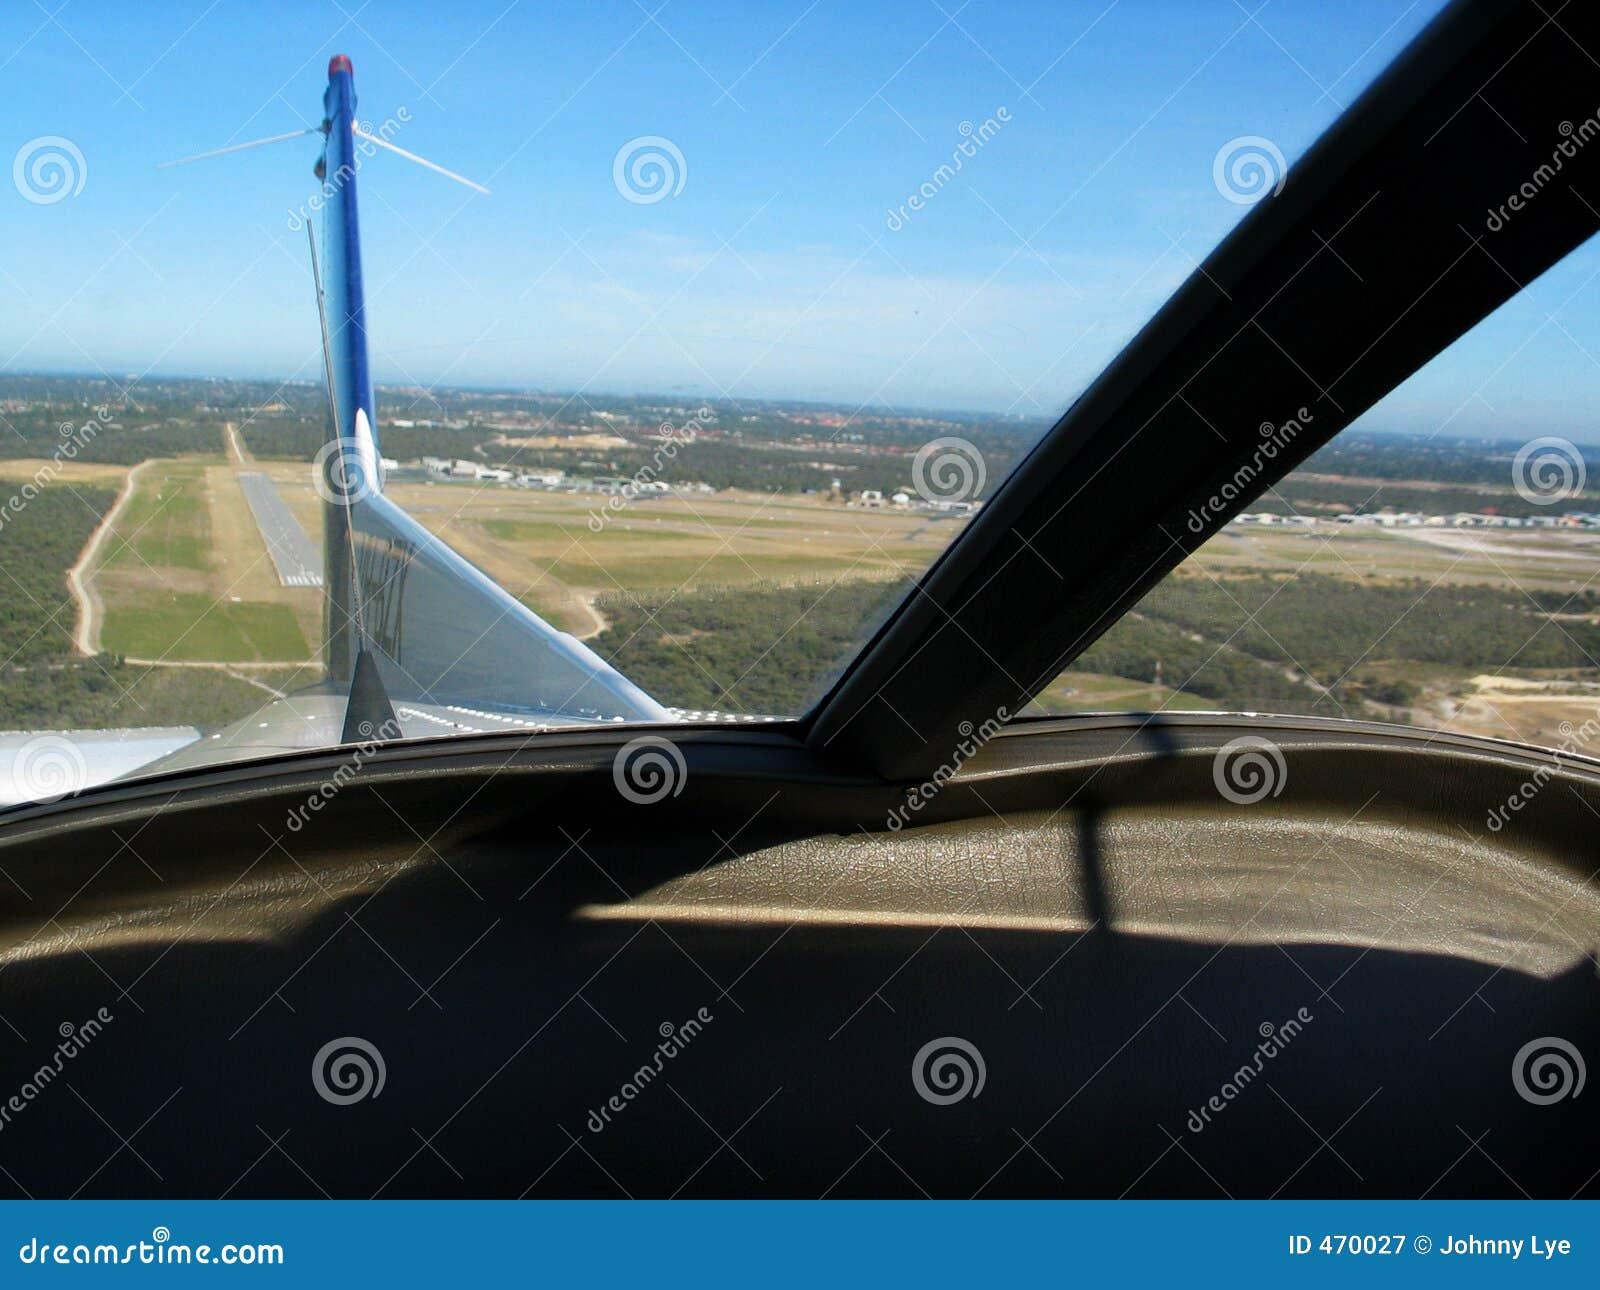 Download Take Off stock image. Image of aircraft, plane, climbing - 470027